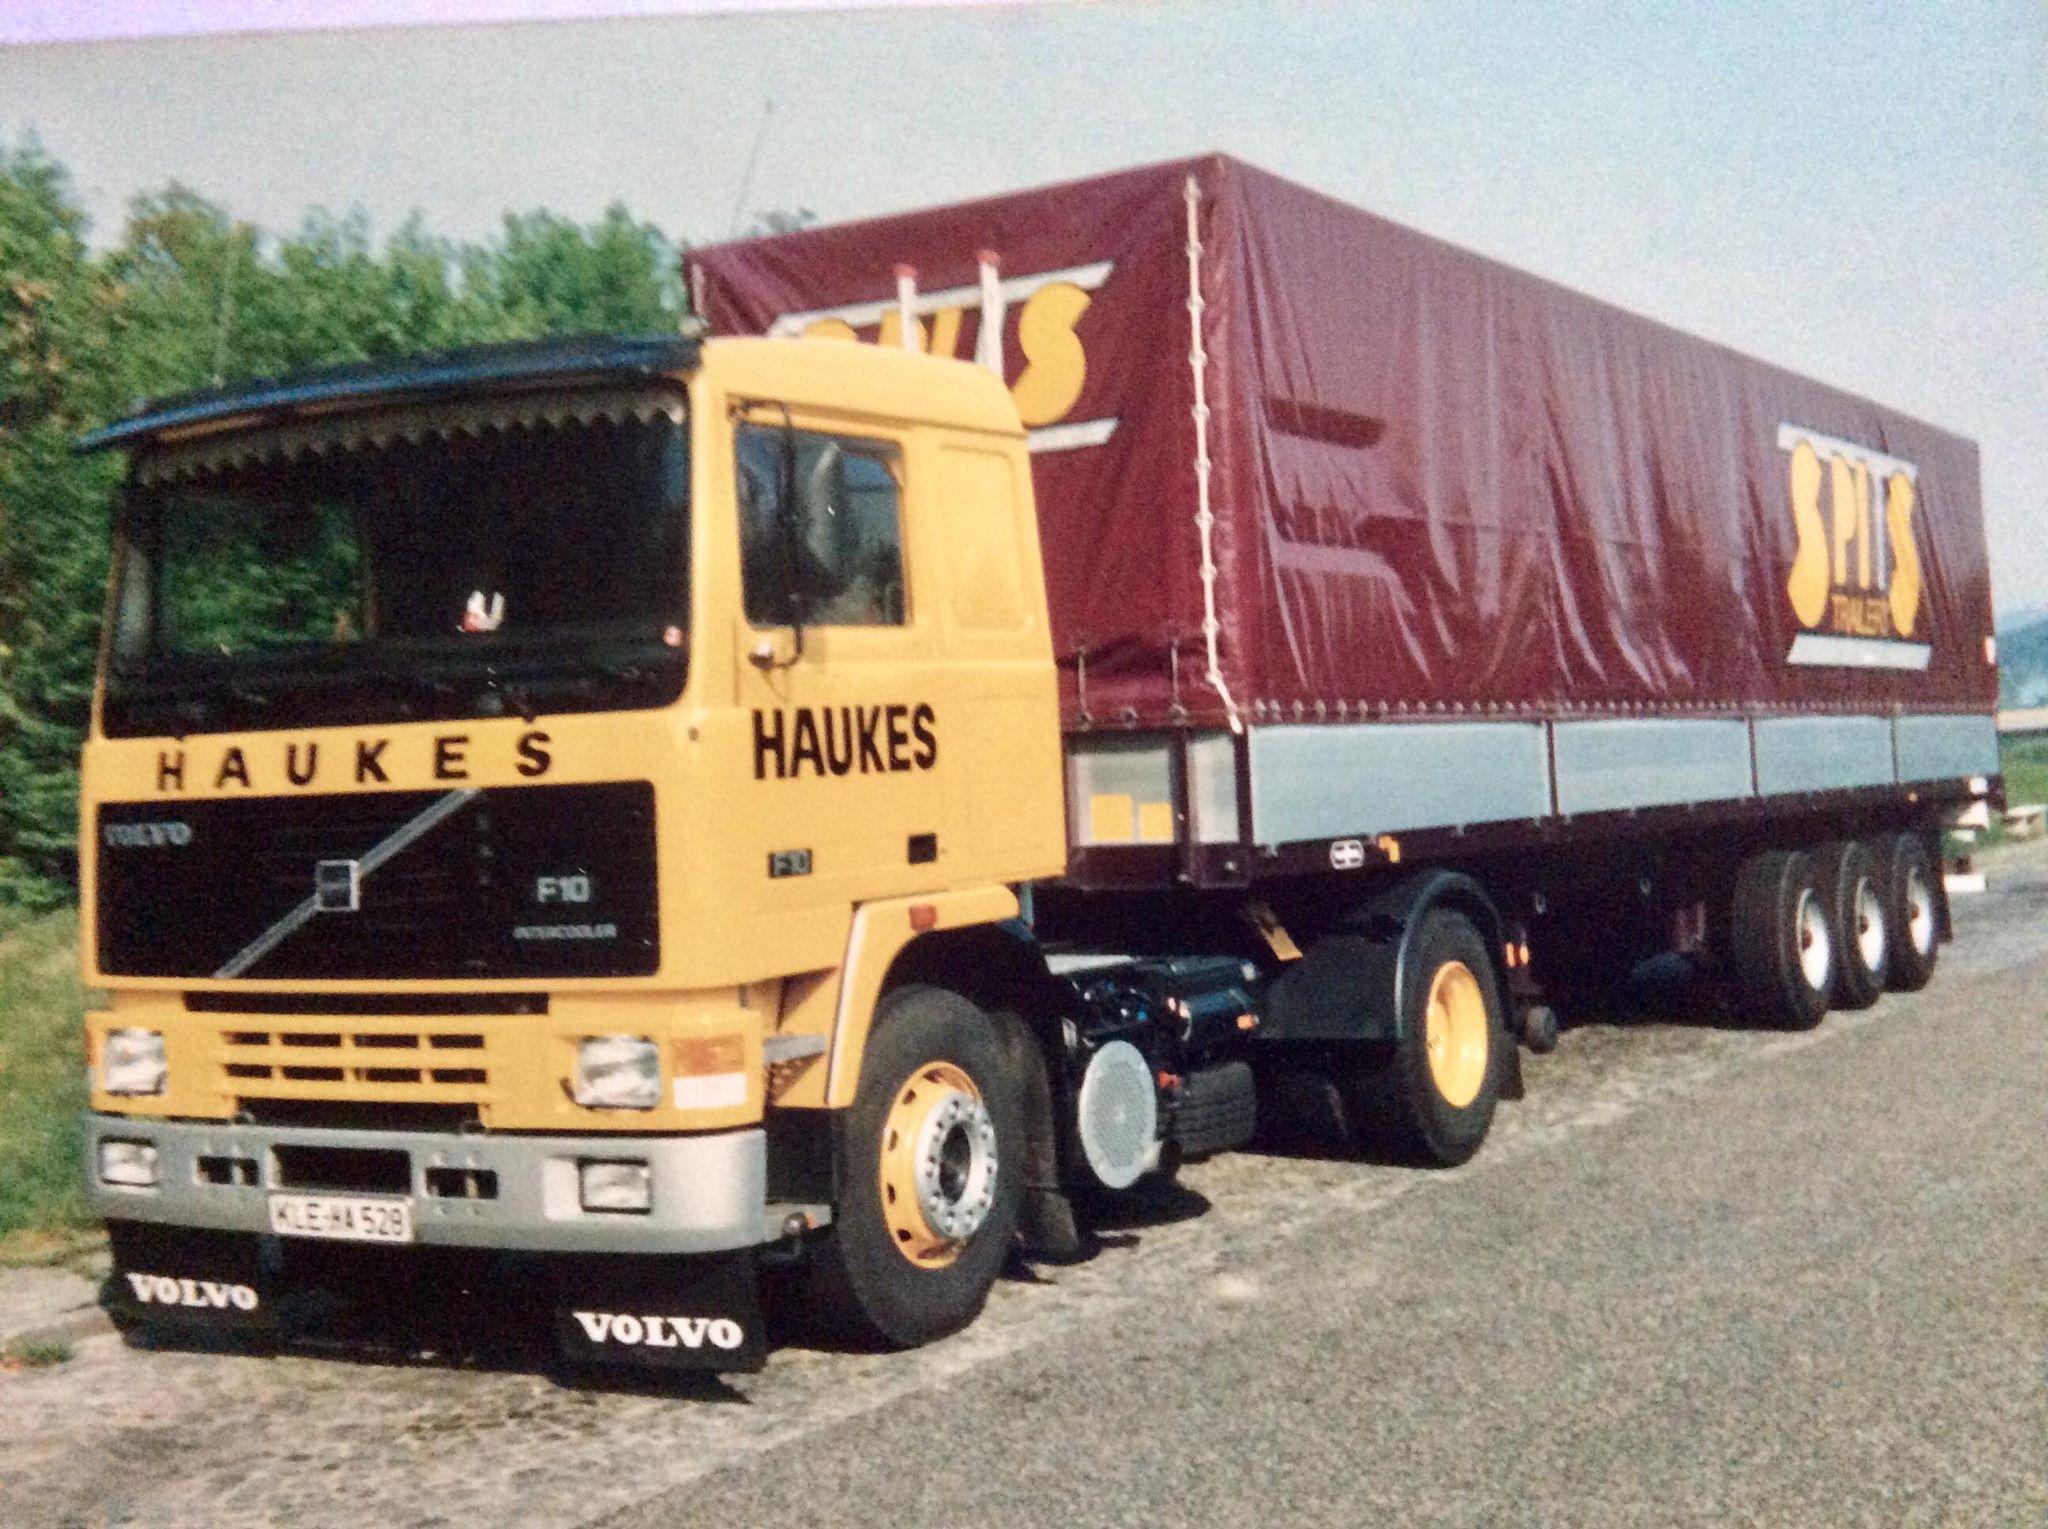 Volvo-Henk-Schmitjes-foto-archief-31